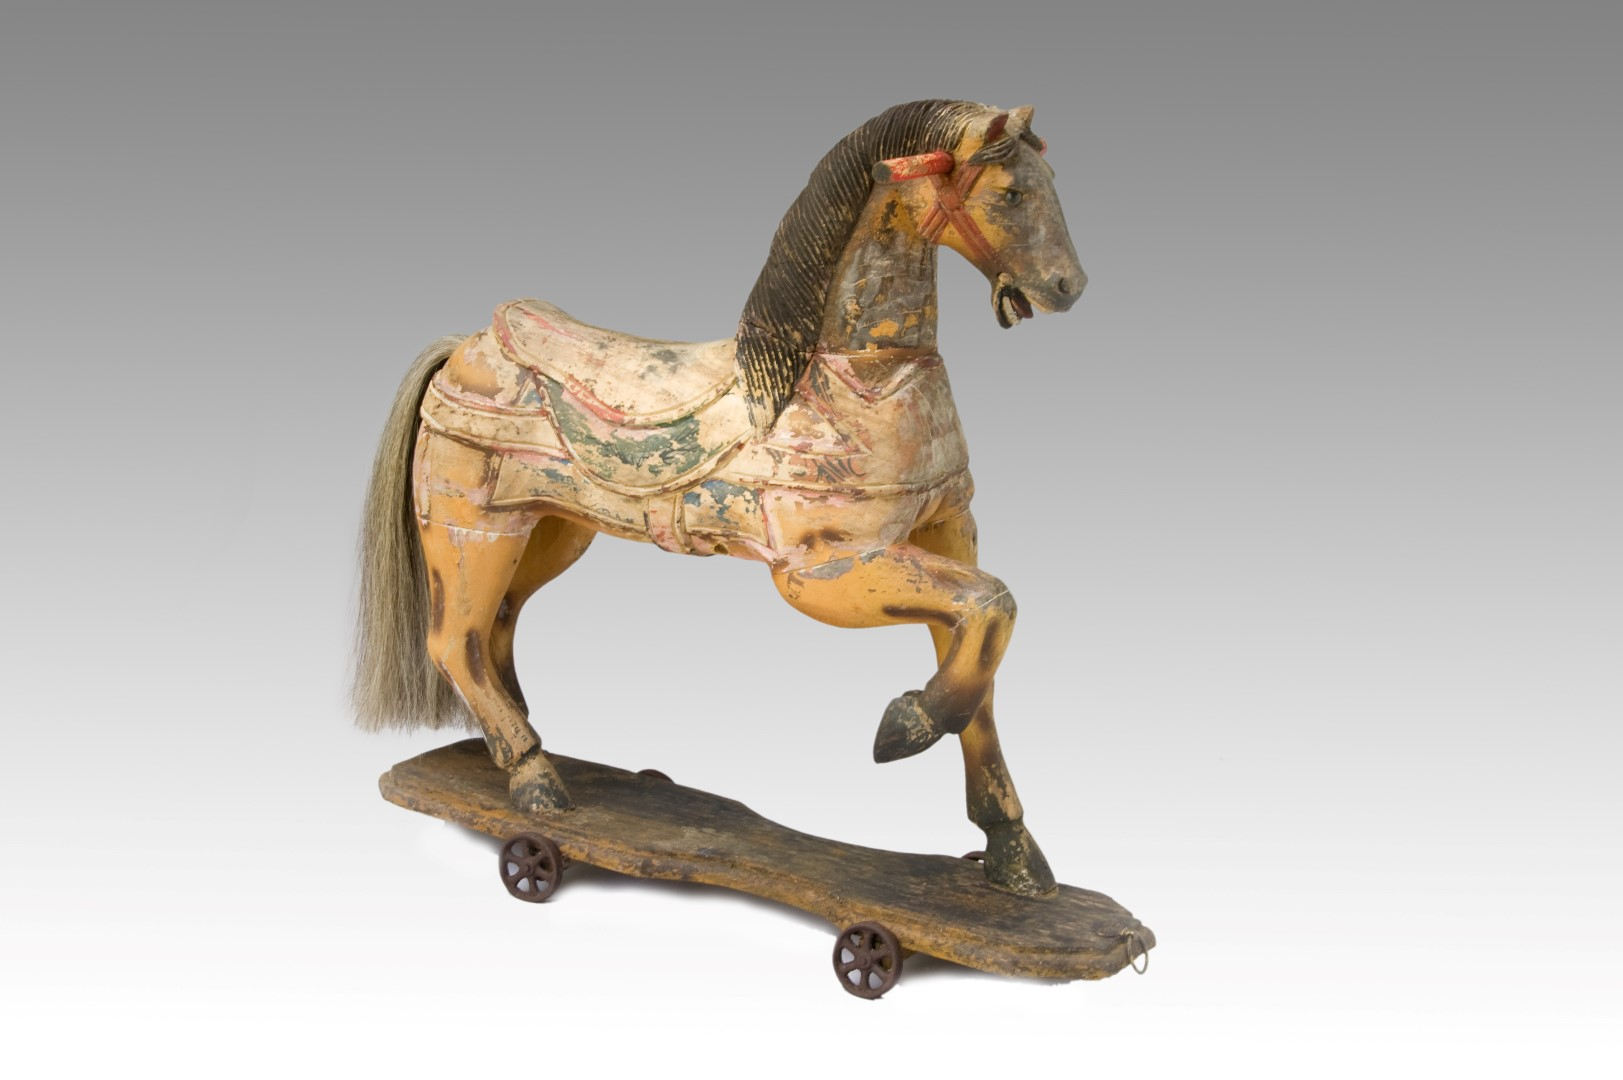 Carousel / Merry-go-round Horse